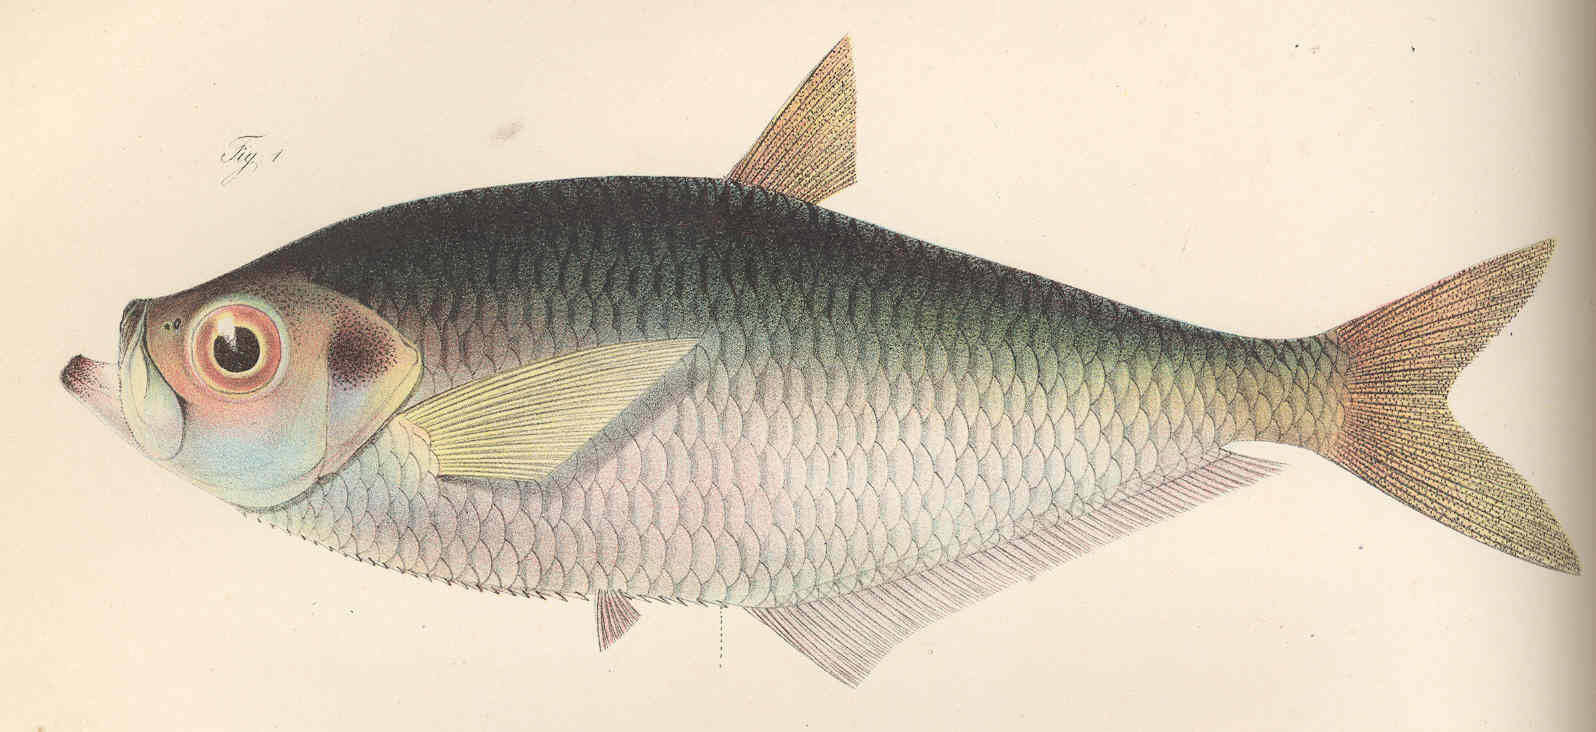 Image of West African ilisha